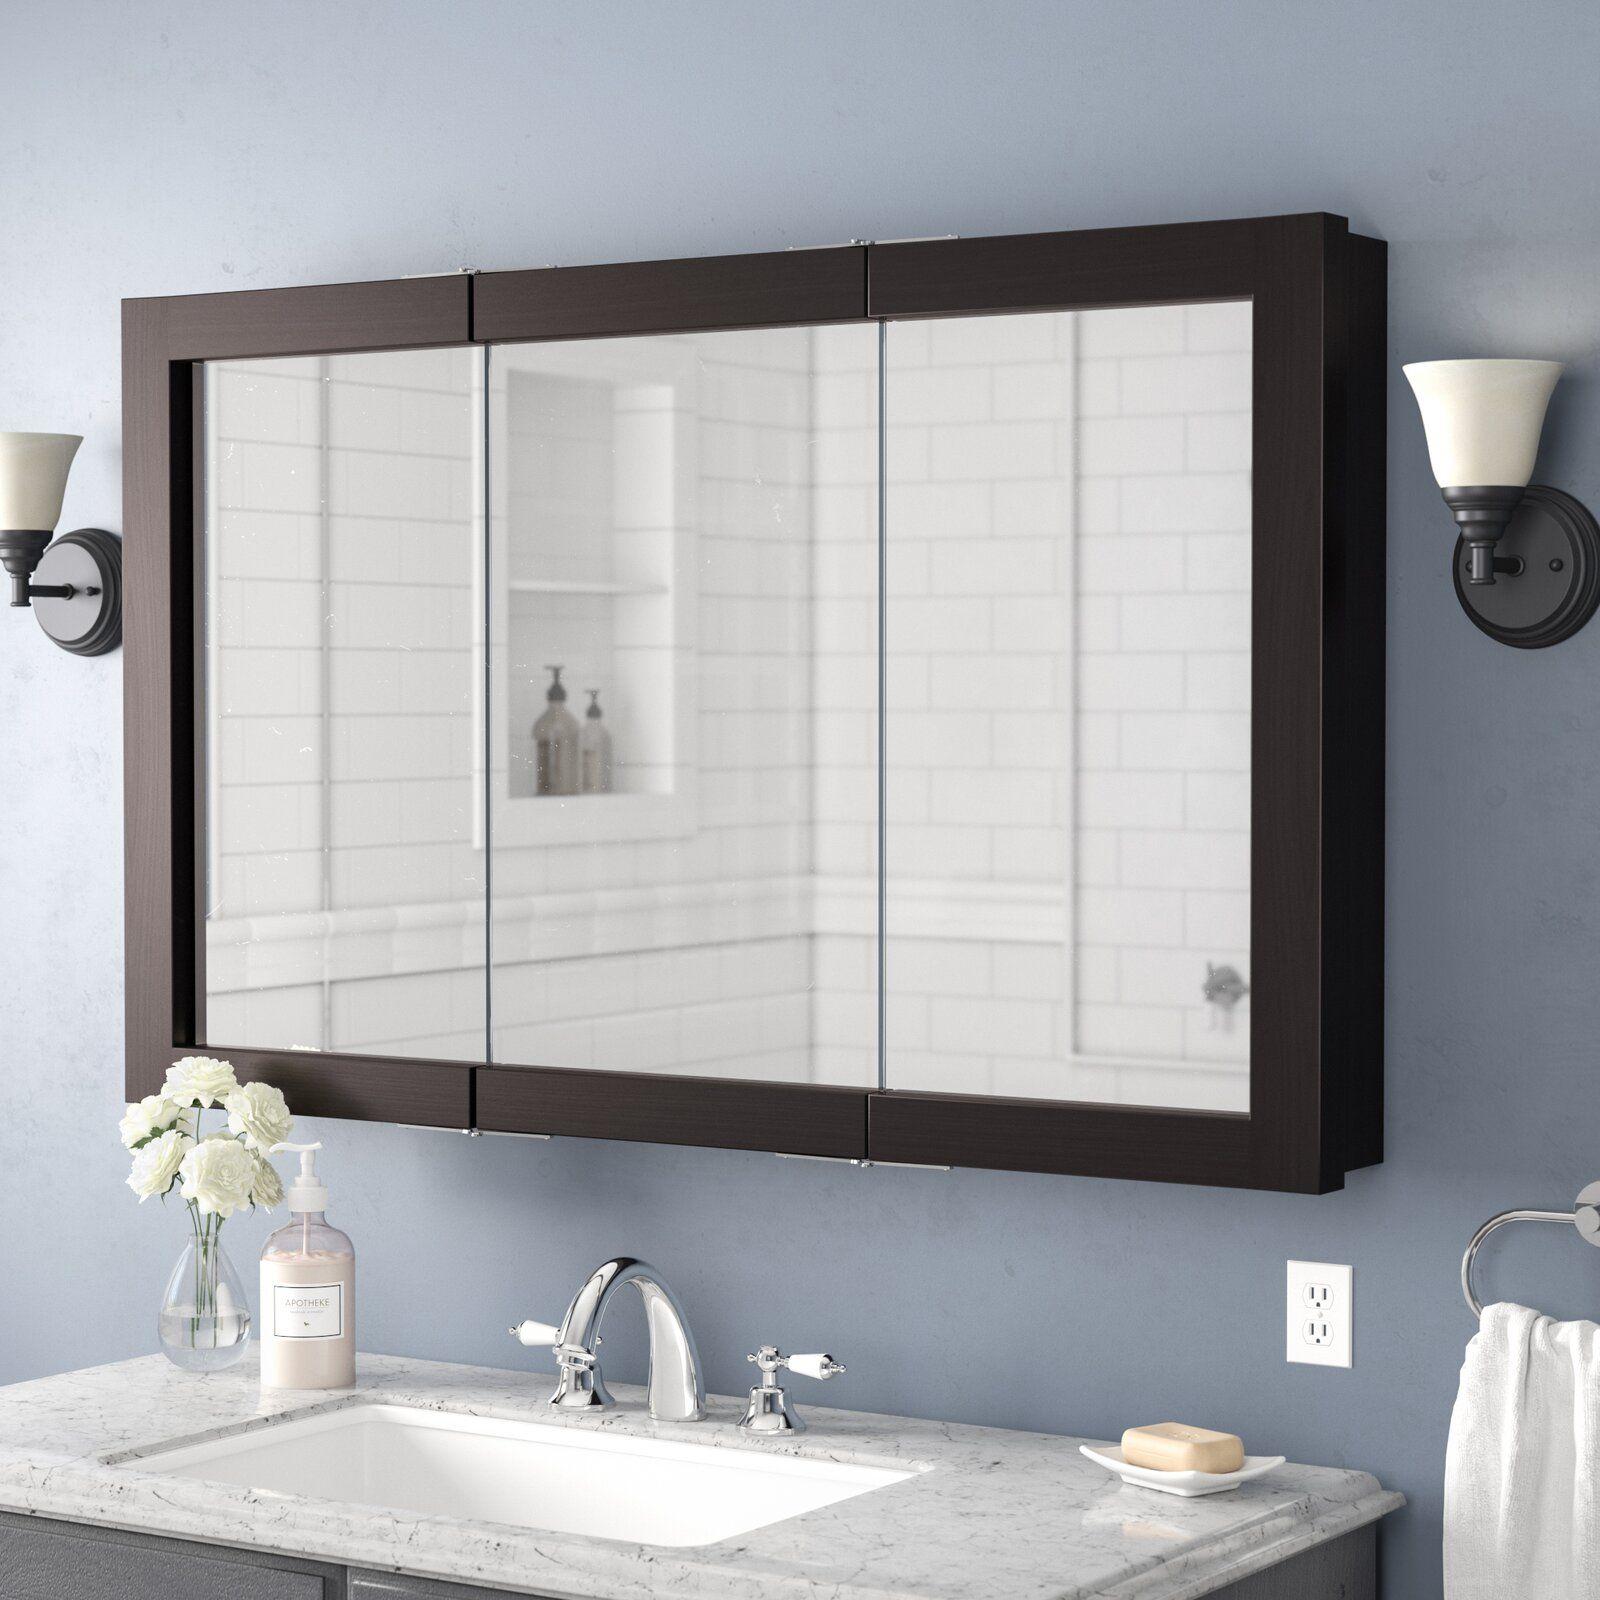 Searle Surface Mount Framed 3 Door Medicine Cabinet With 2 Shelves Bathroom Mirror Cabinet Mirror Cabinets Bathroom Mirror